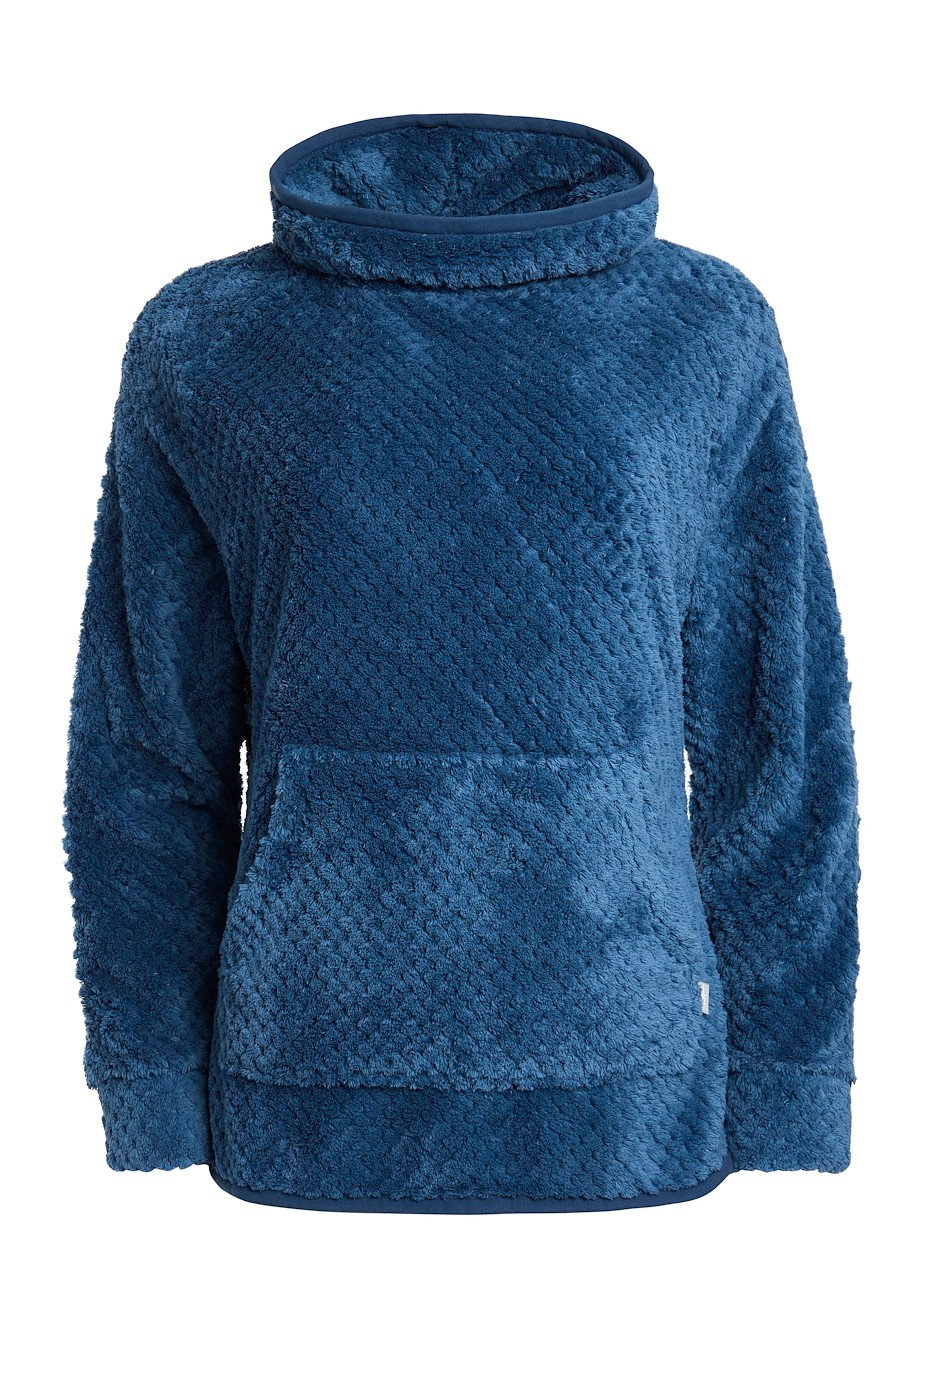 Stella Honeycomb Fur Fleece Ensign Blue